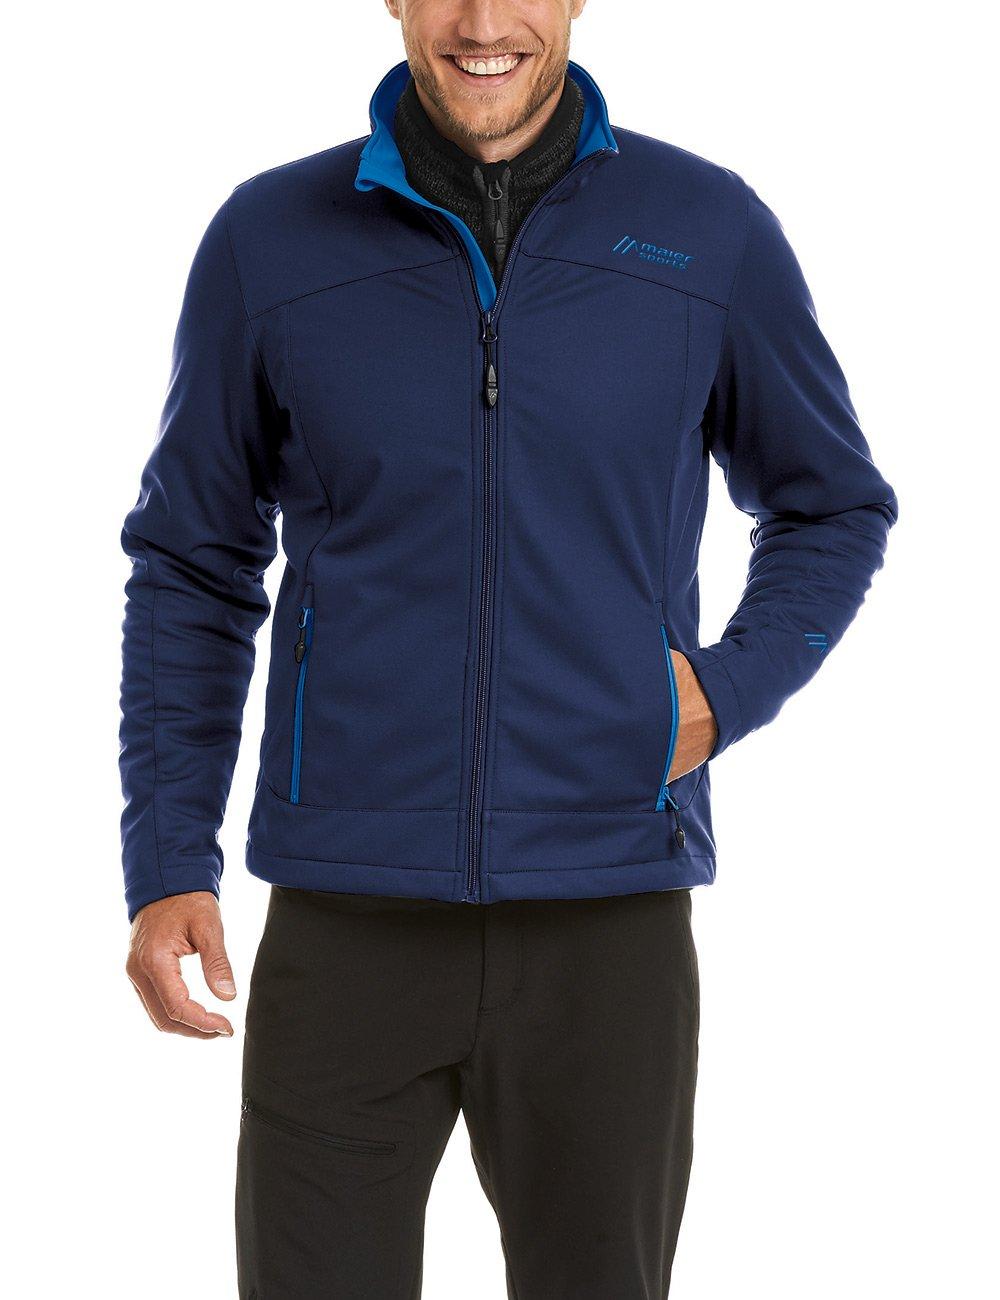 Maier Sports Sirius Men's Softshell Jacket